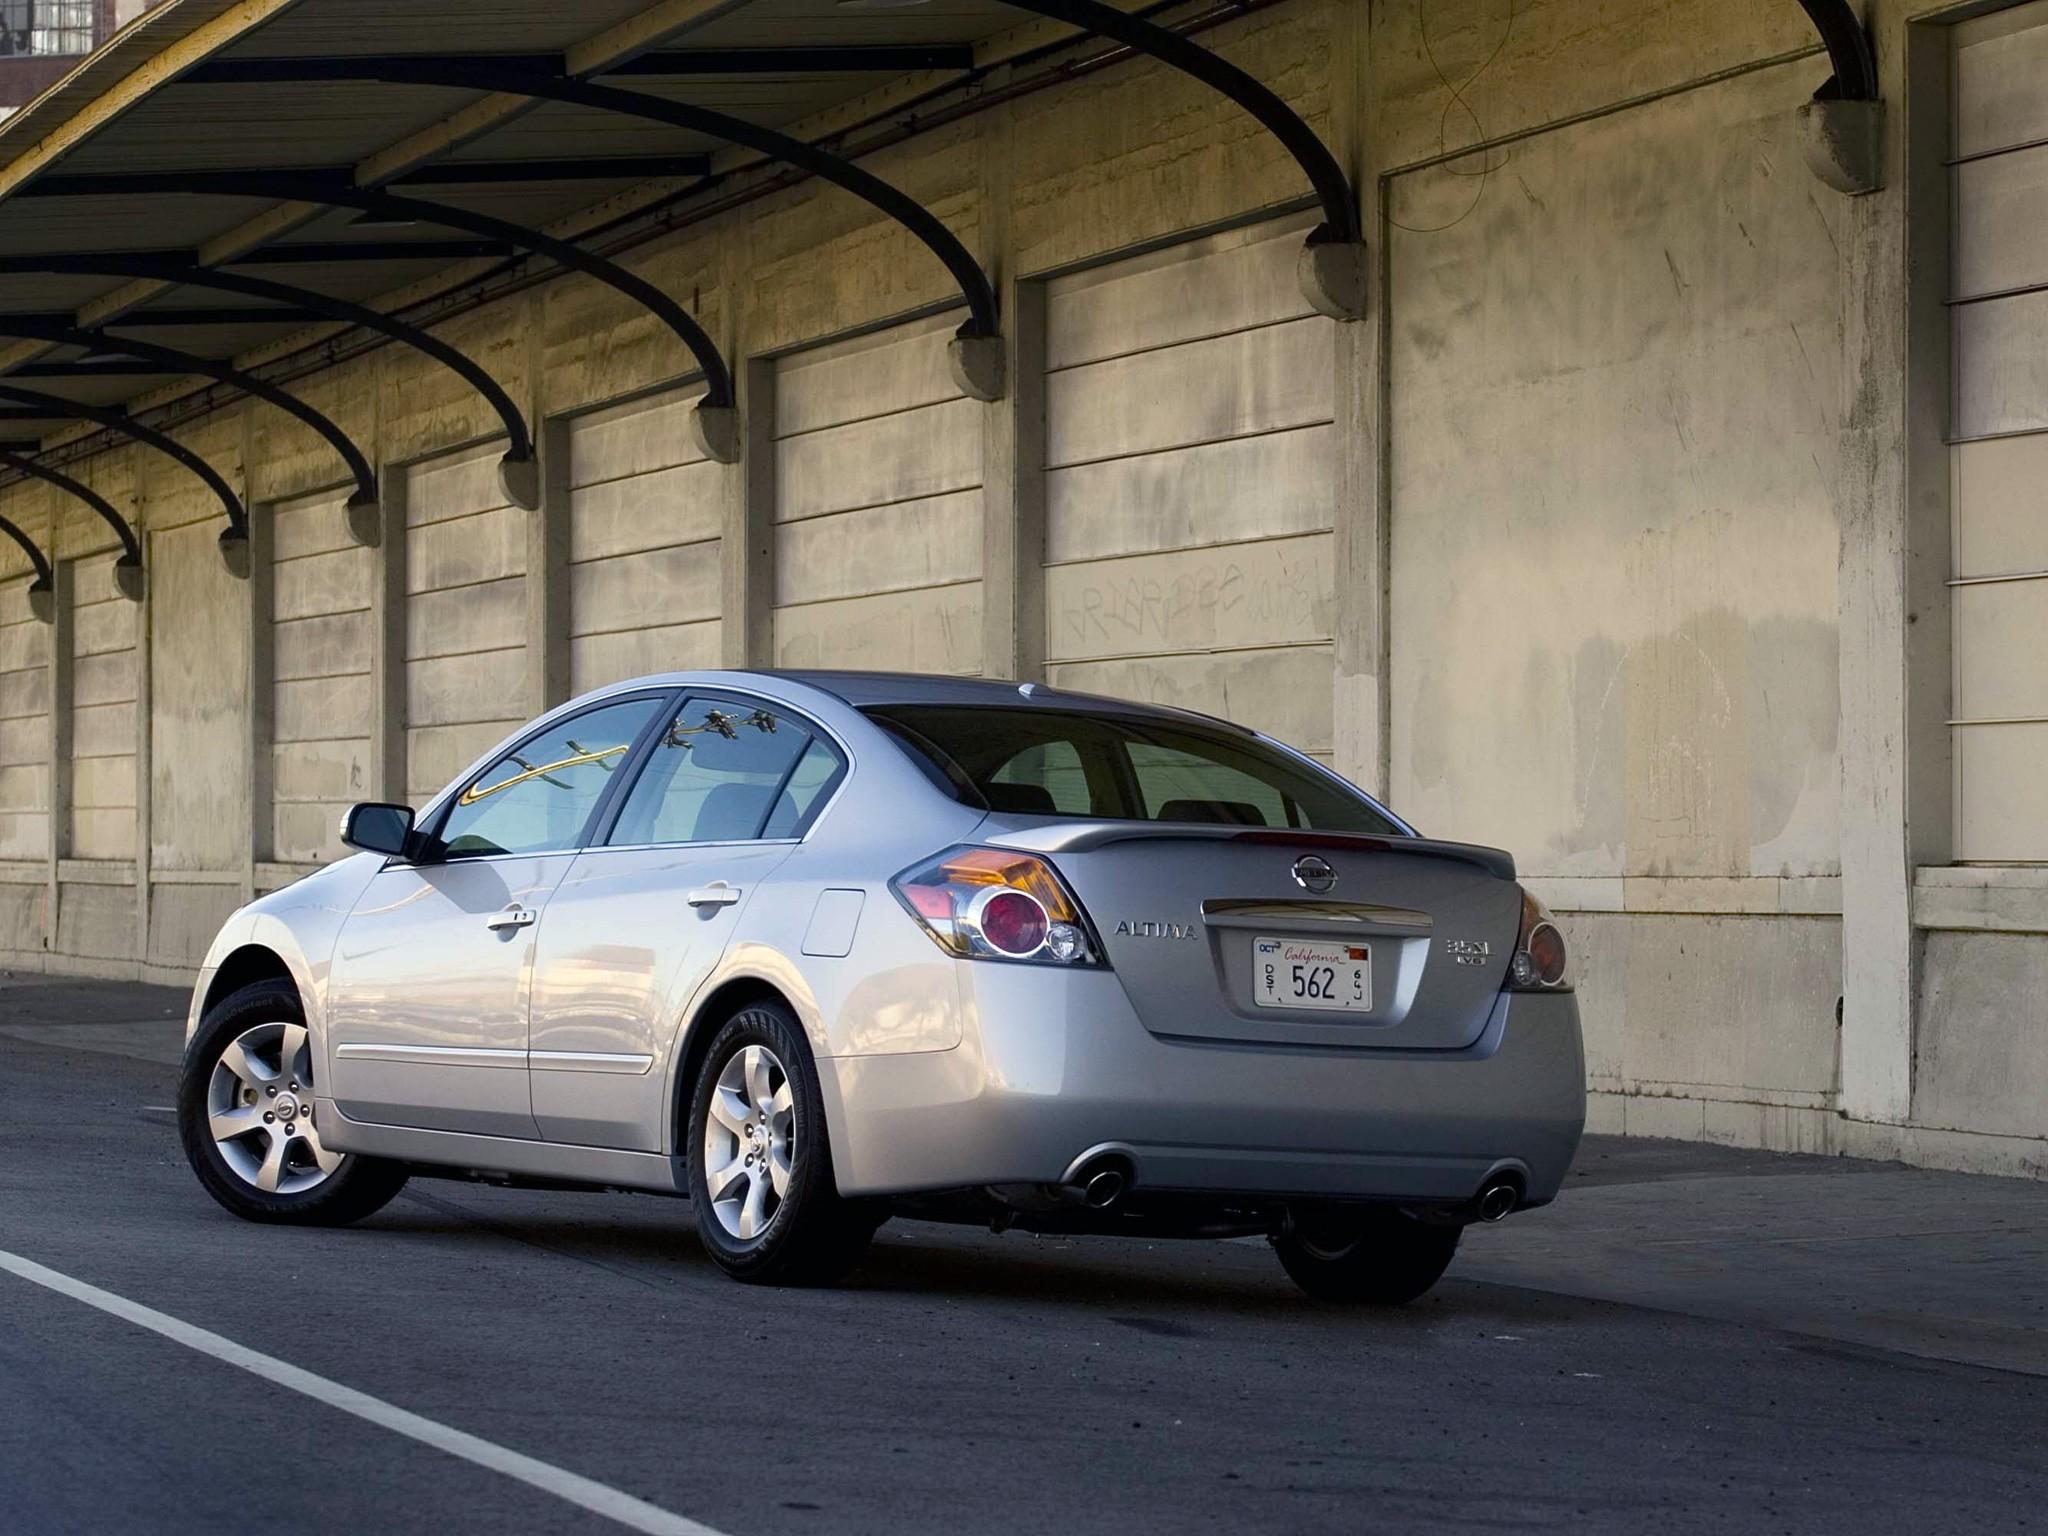 Nissan Altima 2.5 S >> NISSAN Altima specs & photos - 2007, 2008, 2009, 2010 ...